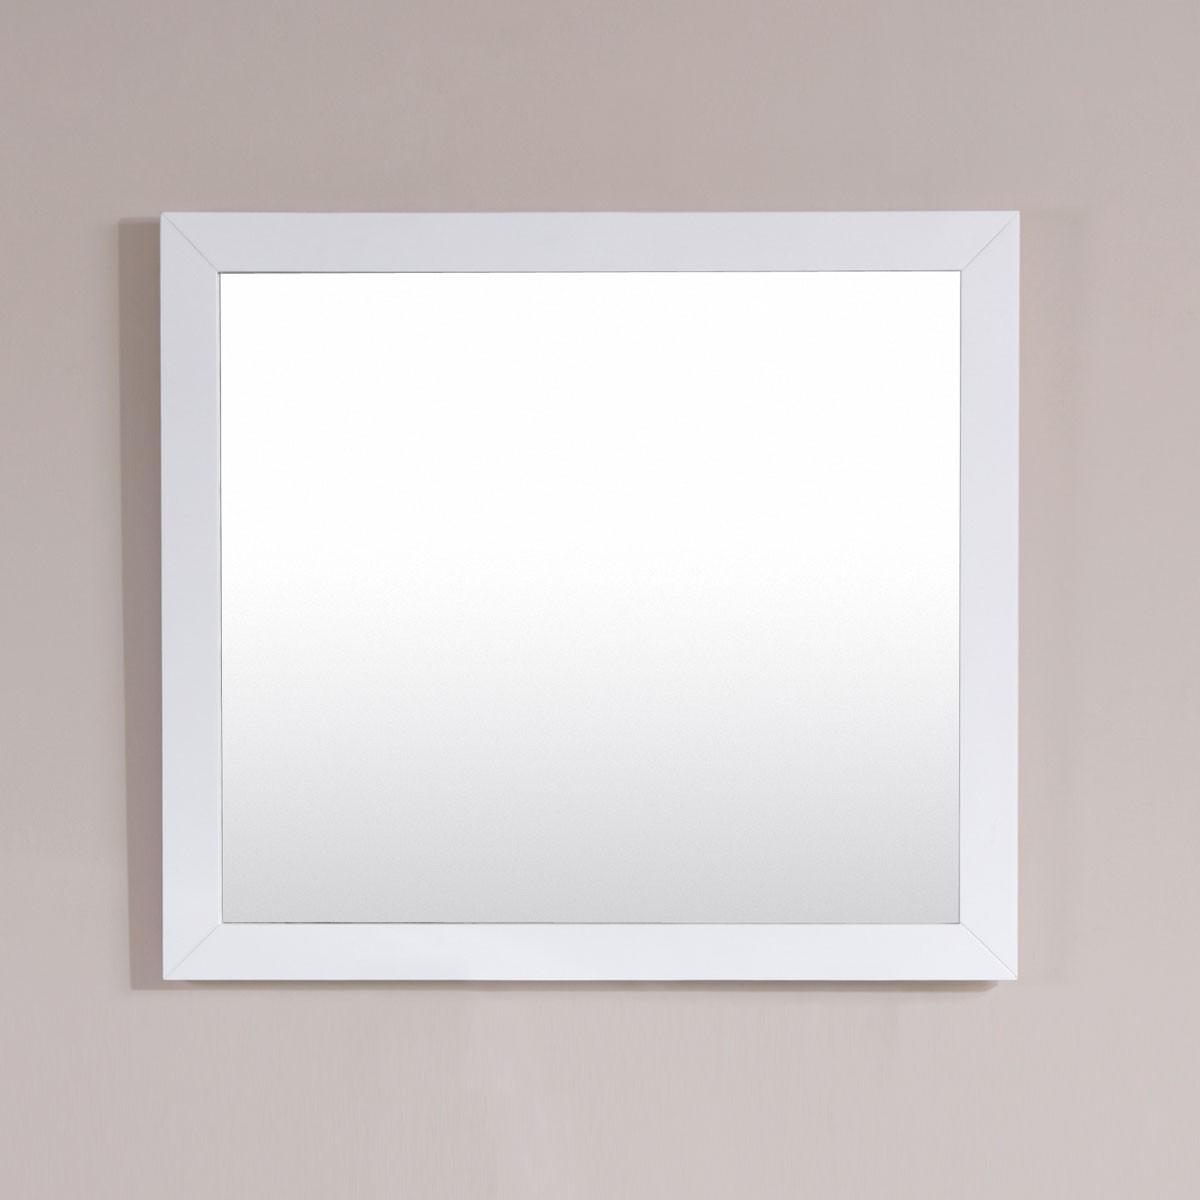 36 x 31 po Miroir avec cadre blanc (DK-T9312-36WM)